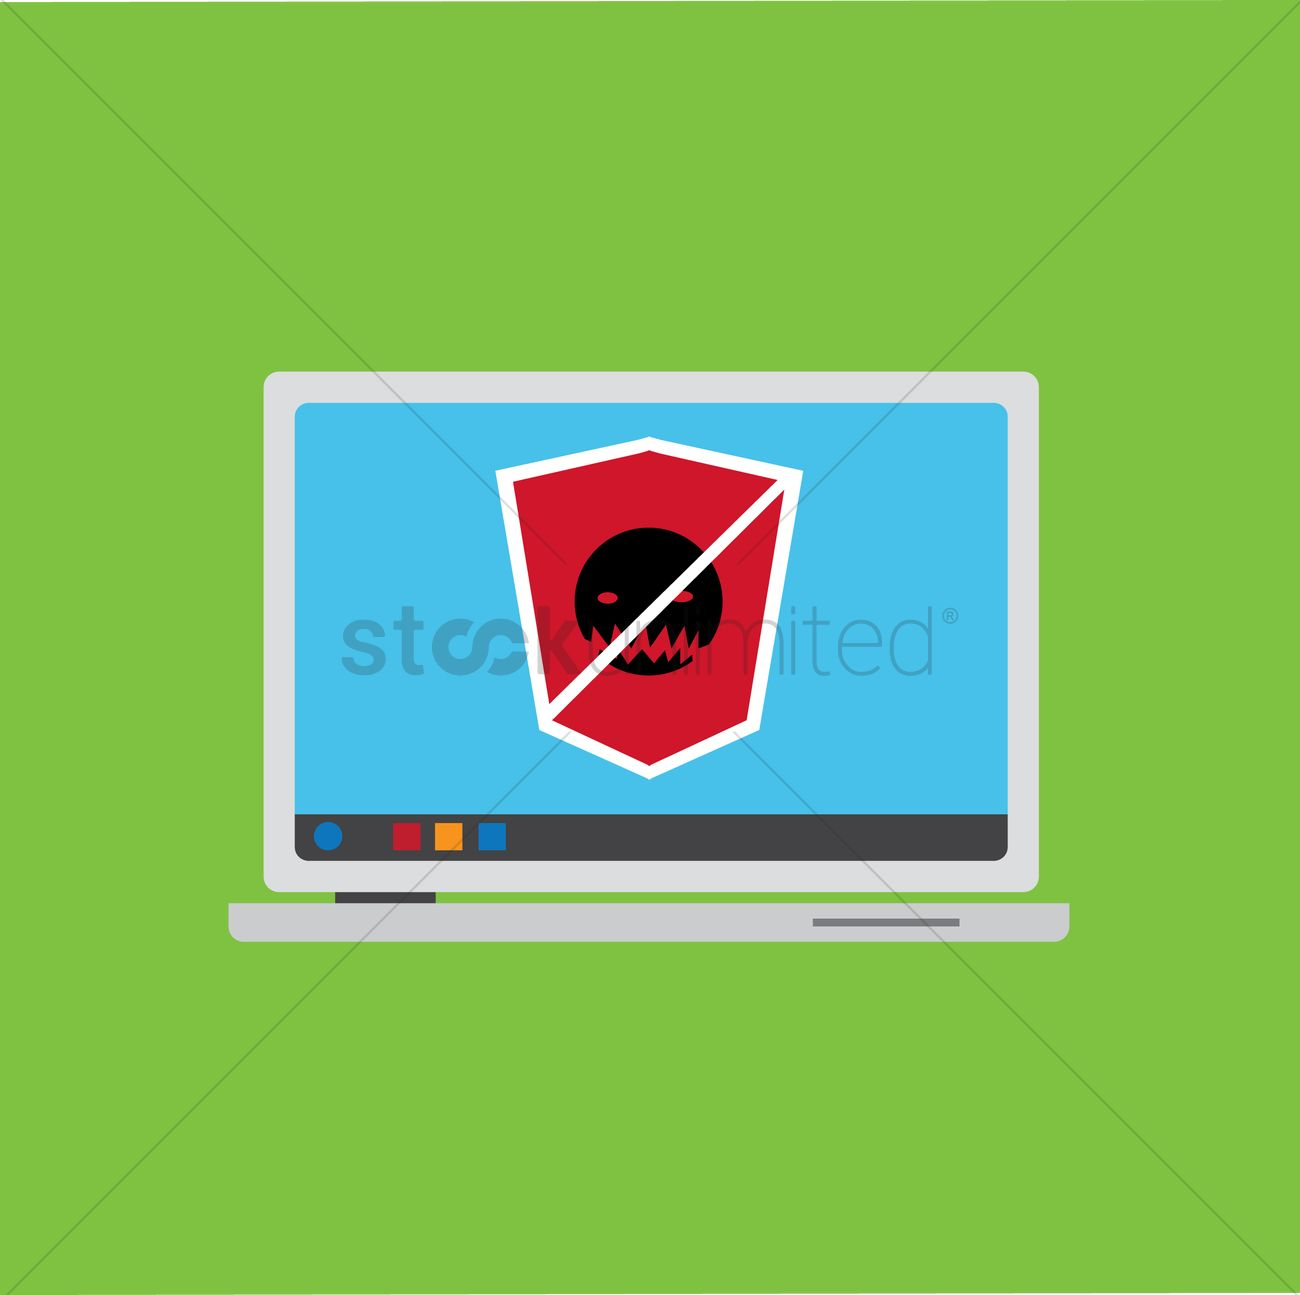 Computer antivirus on a laptop Vector Image - 1263600